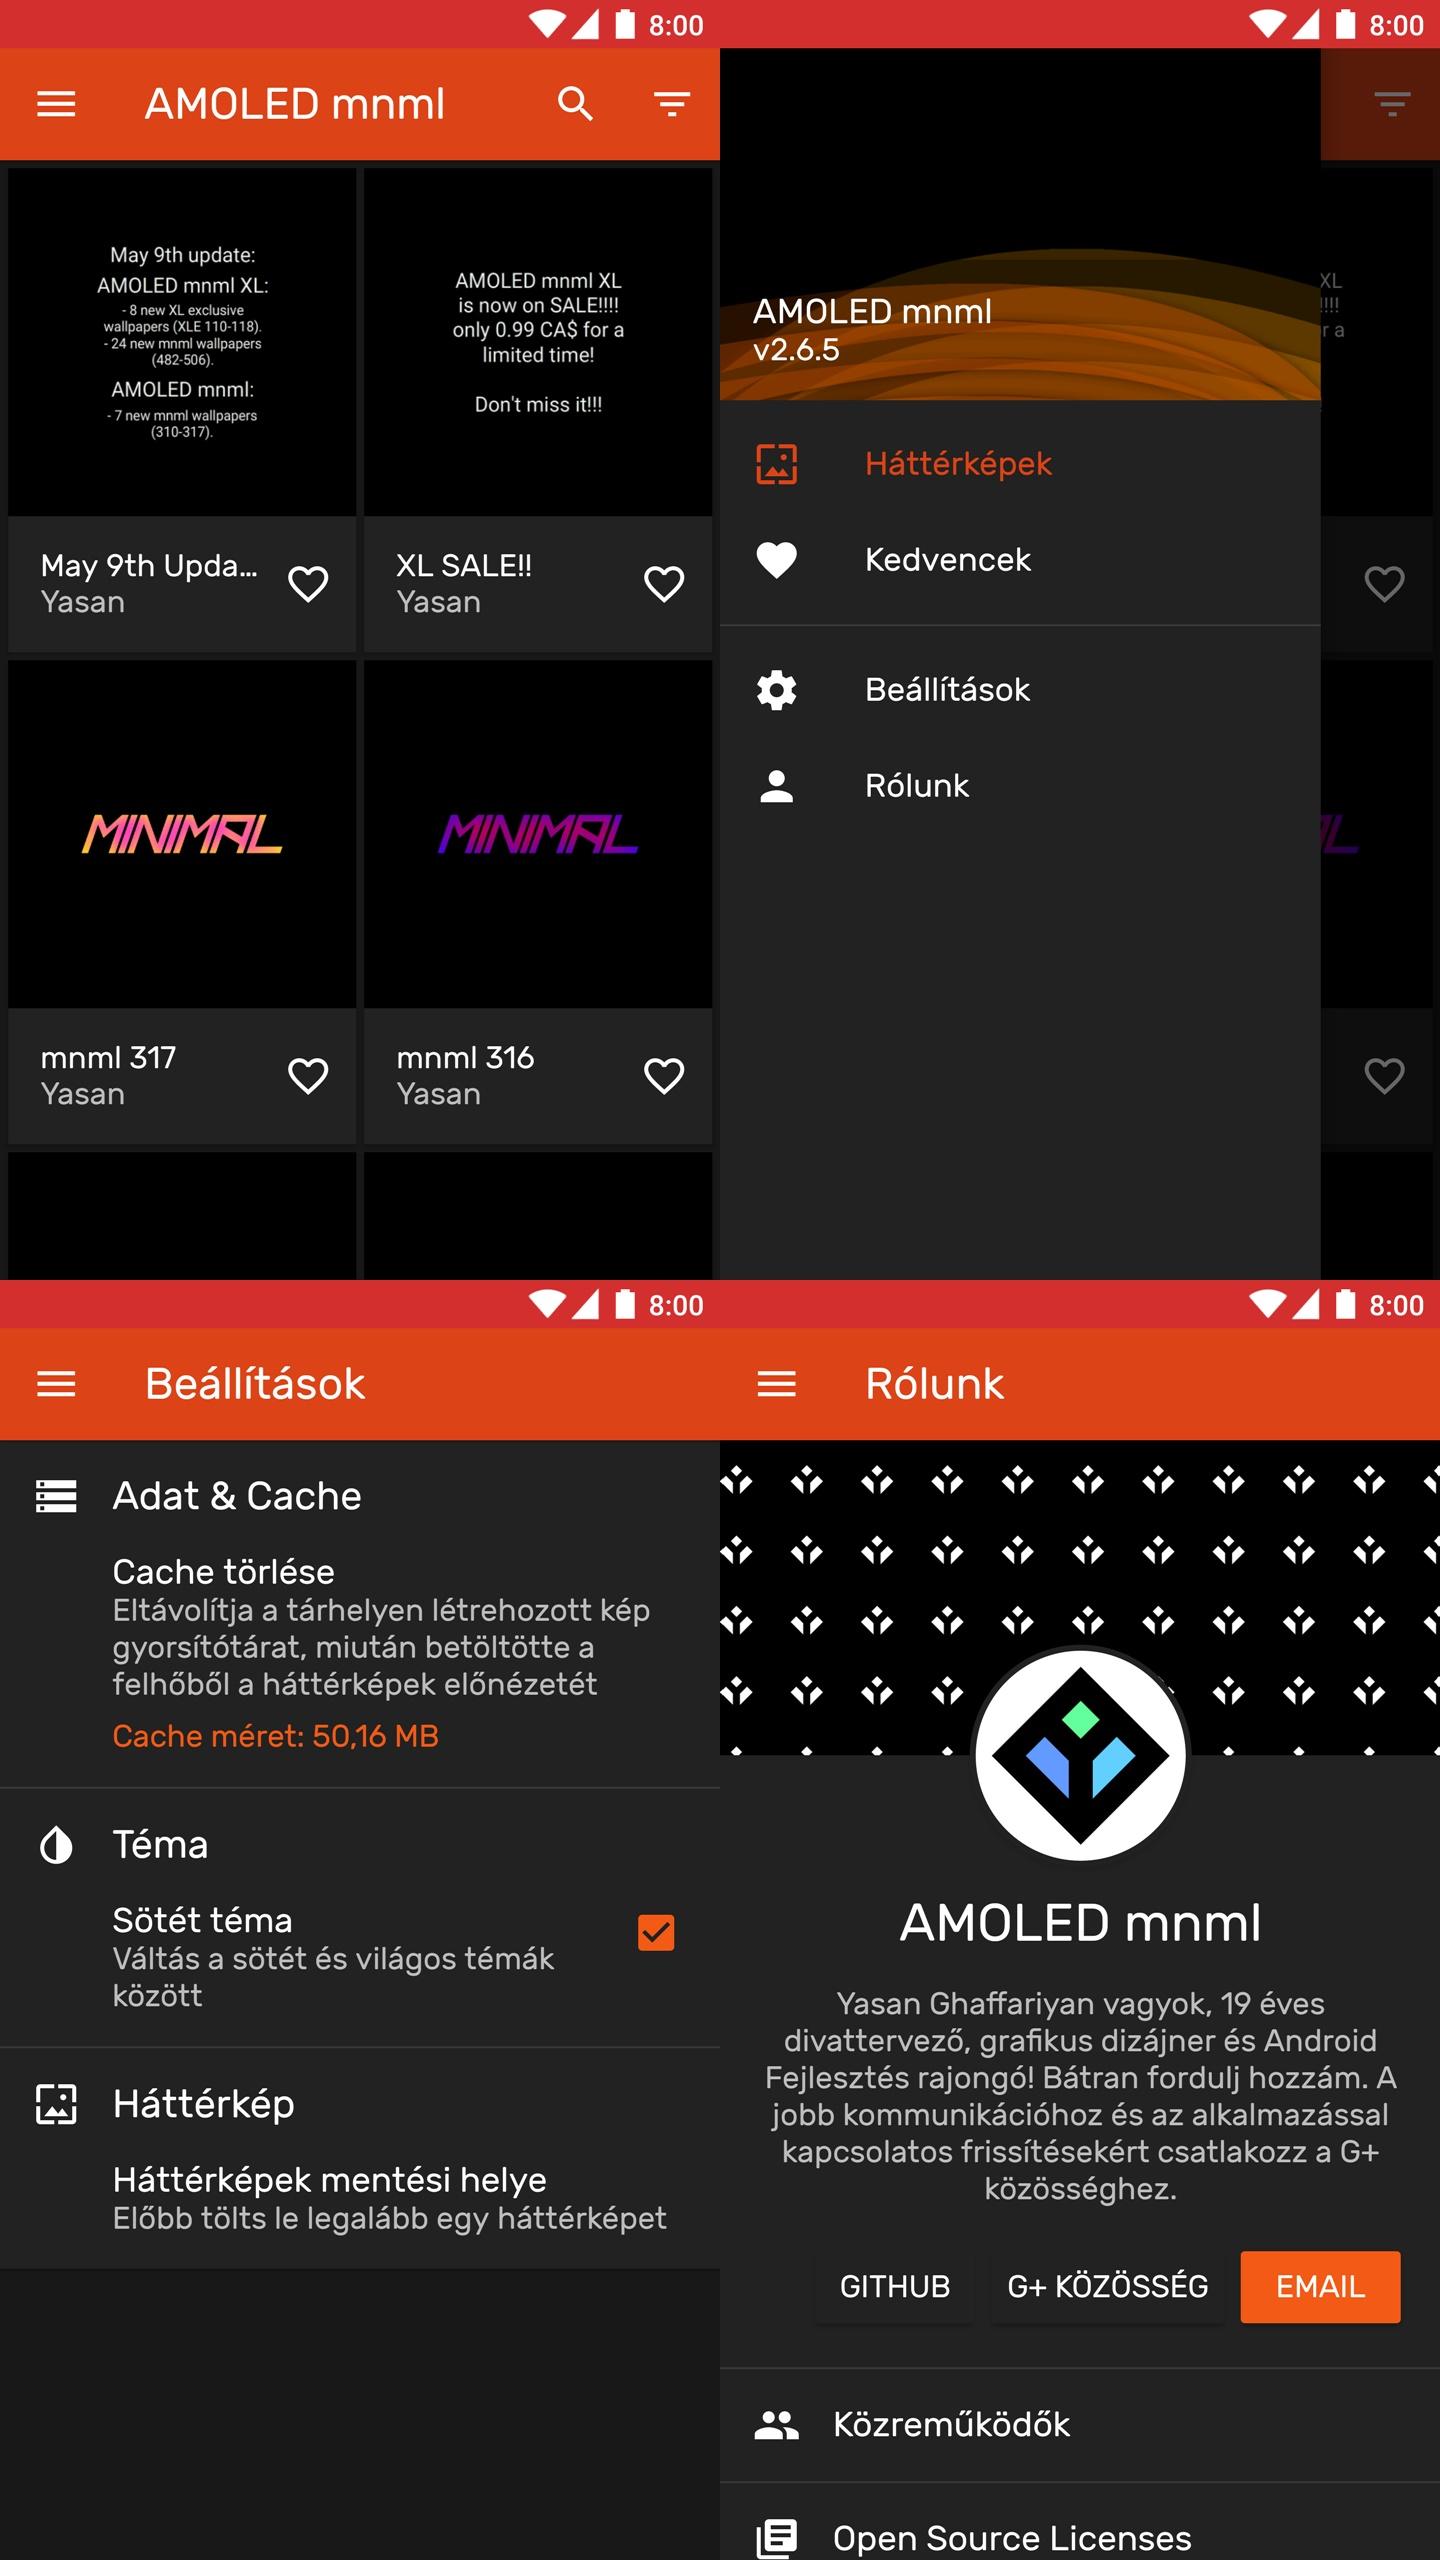 amoled_mnml_post.jpg